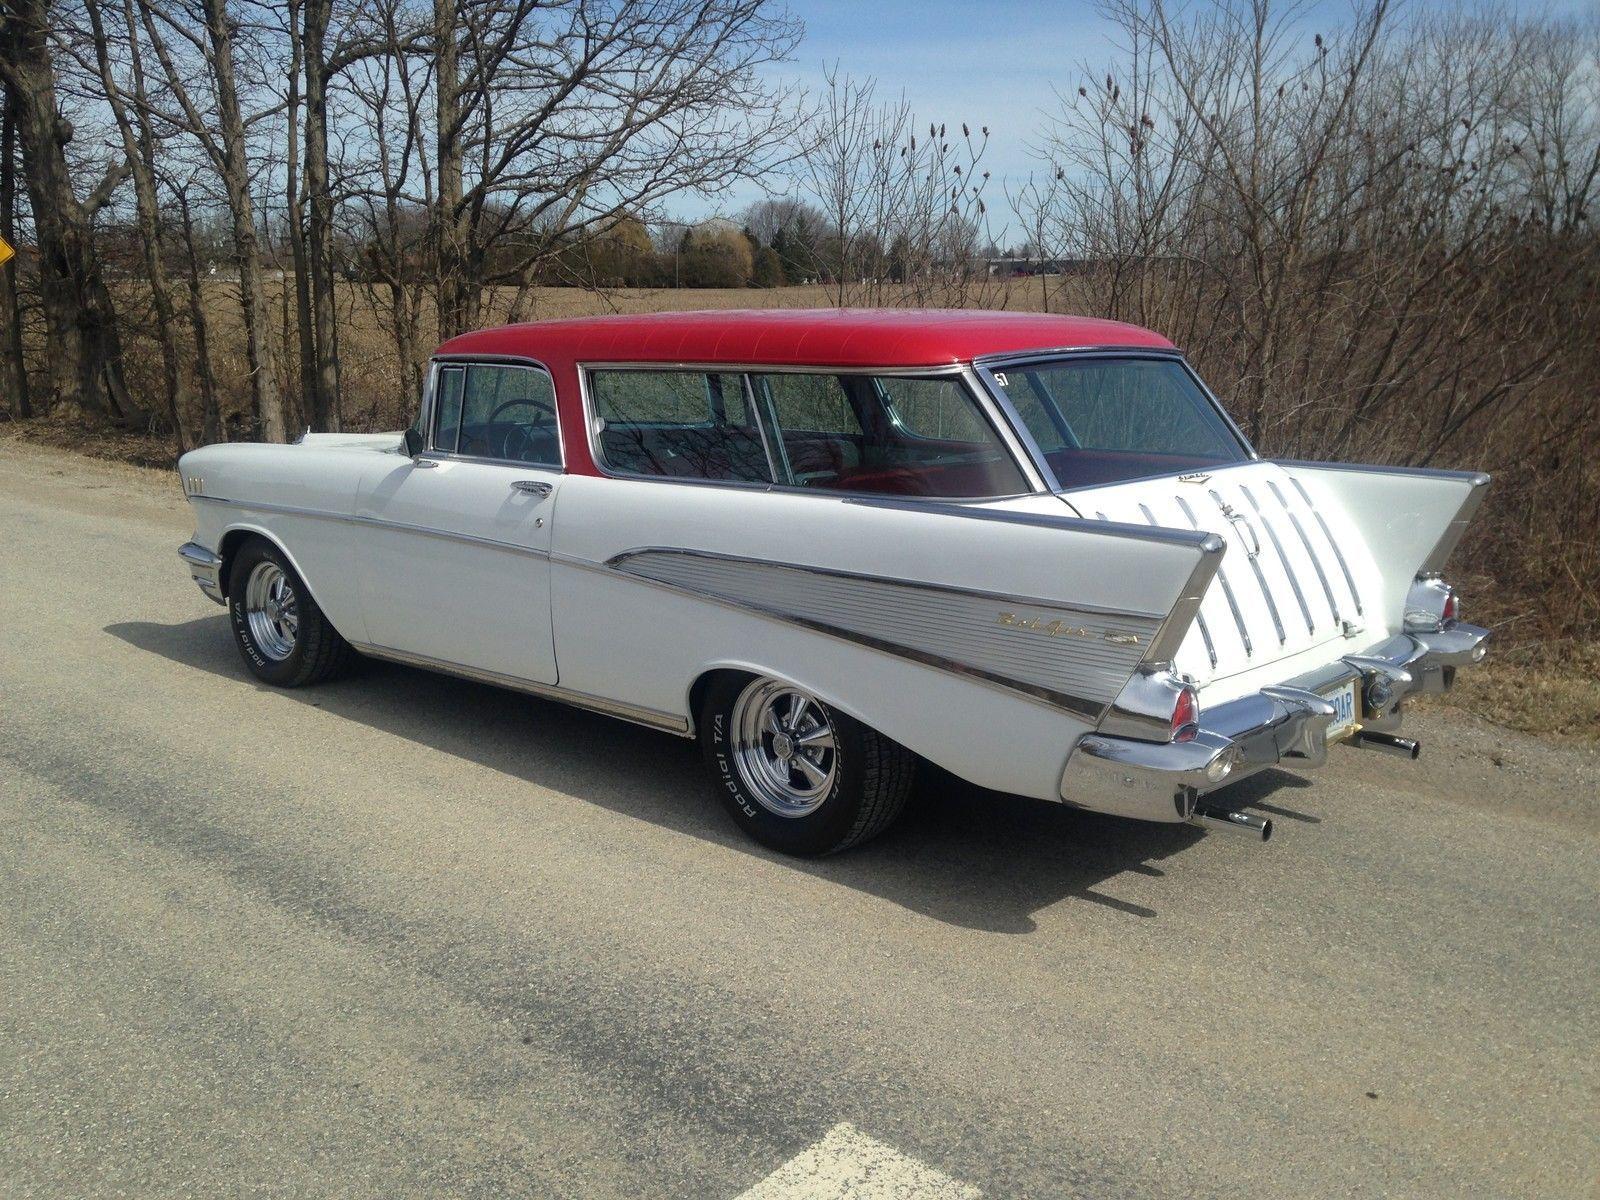 Chevrolet Details About Nomad Door Ebaydetails About 1957